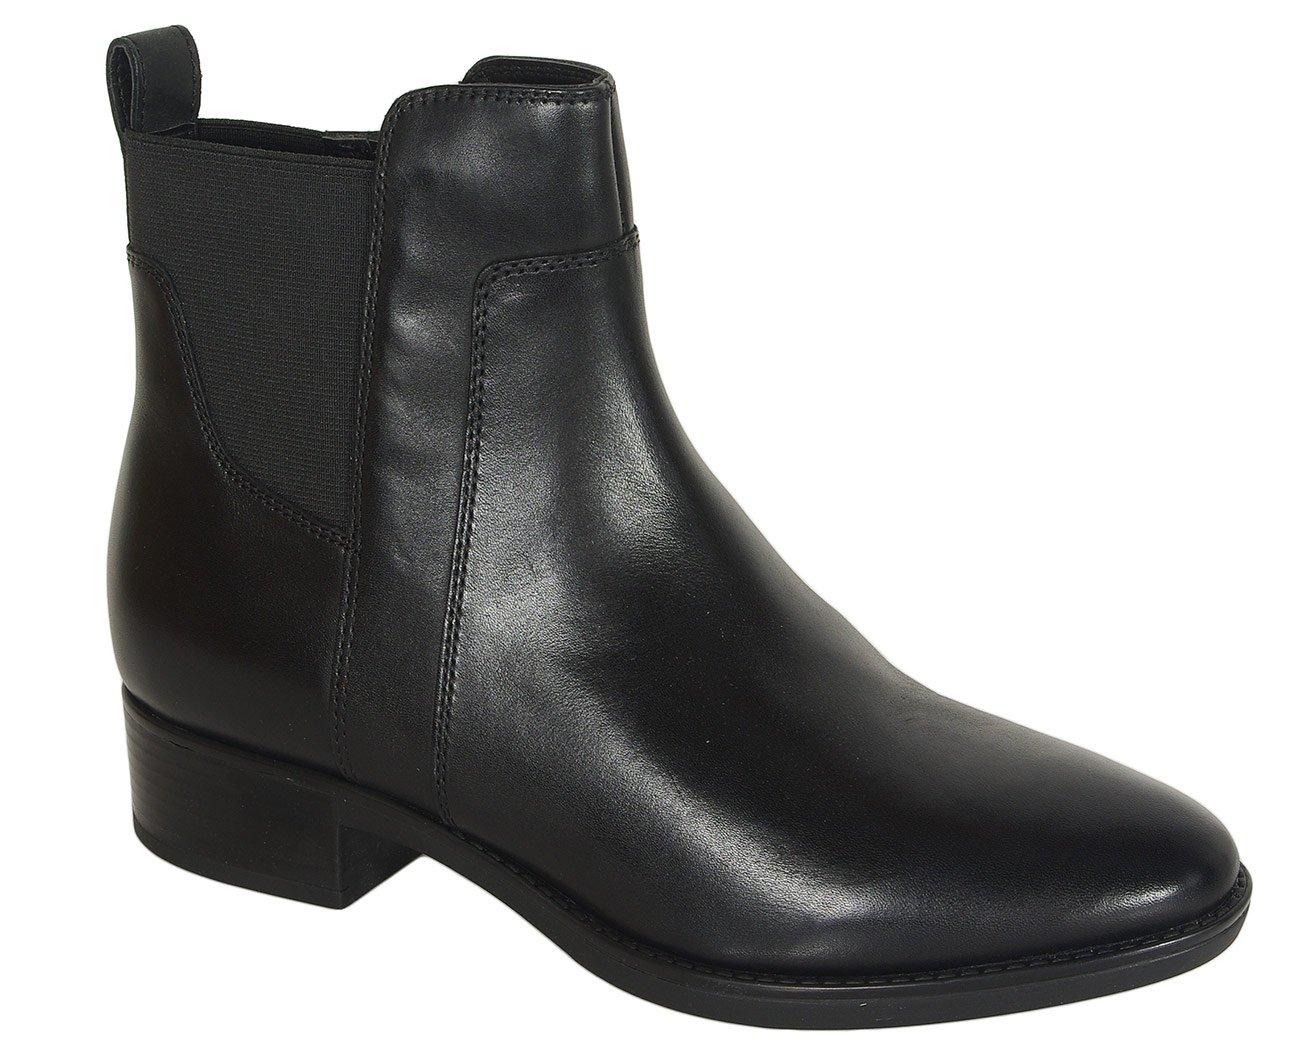 Geox Felicity G botki leather black